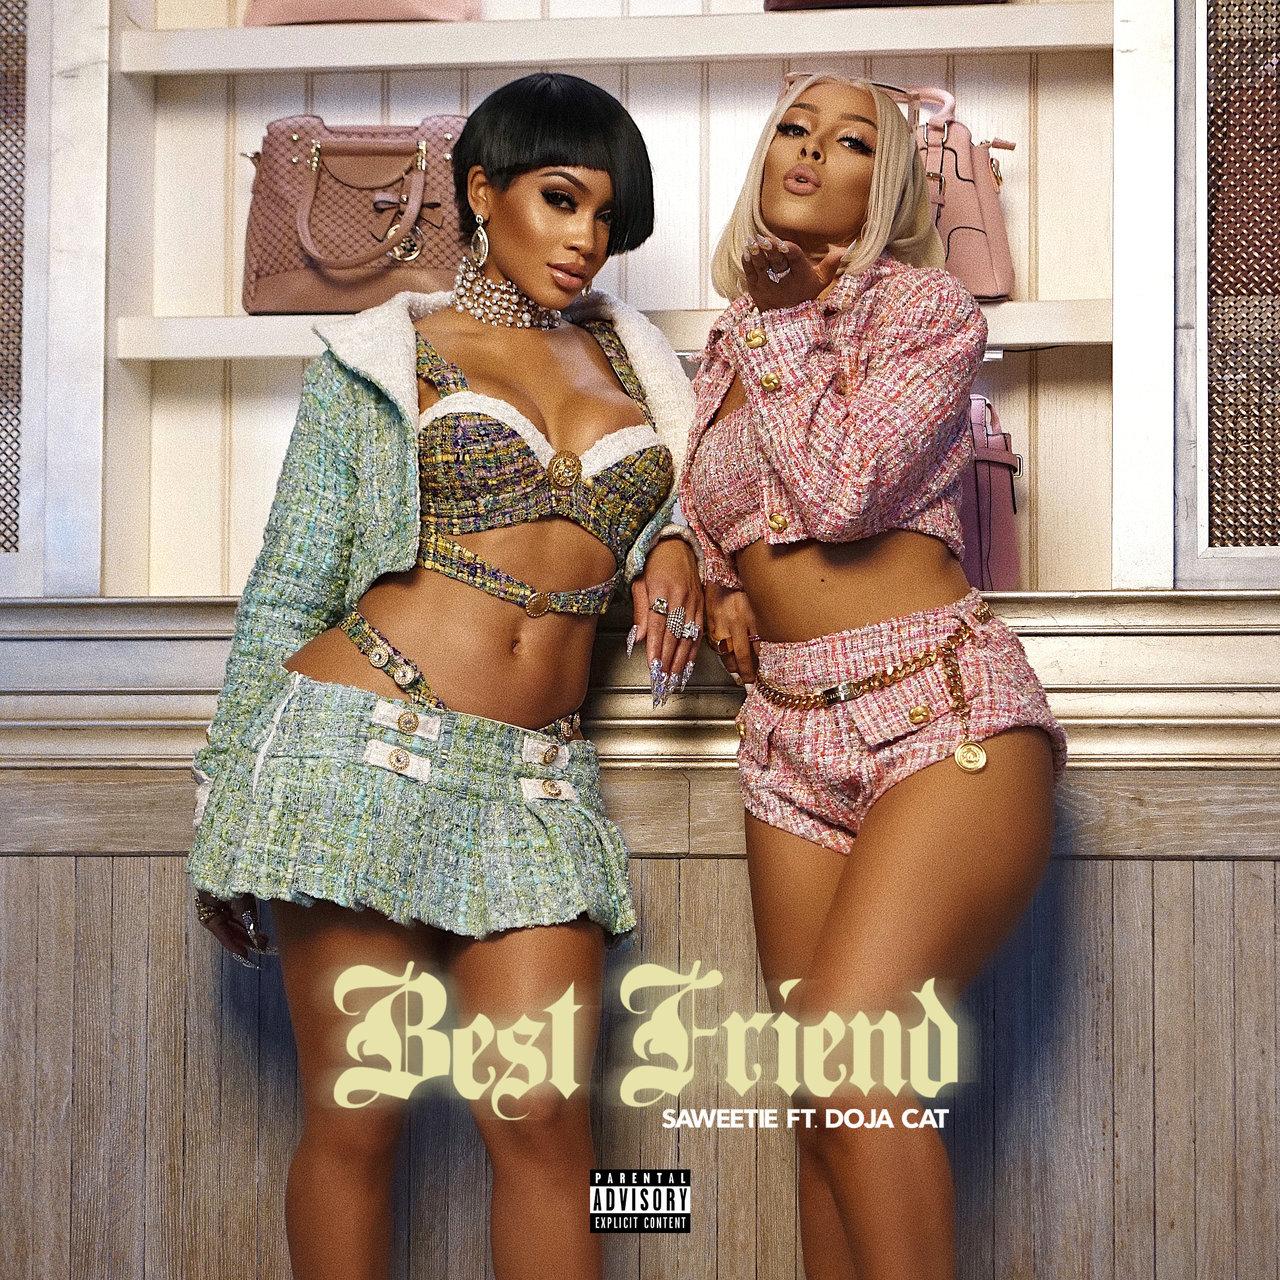 Saweetie - Best Friend (ft. Doja Cat) (Cover)